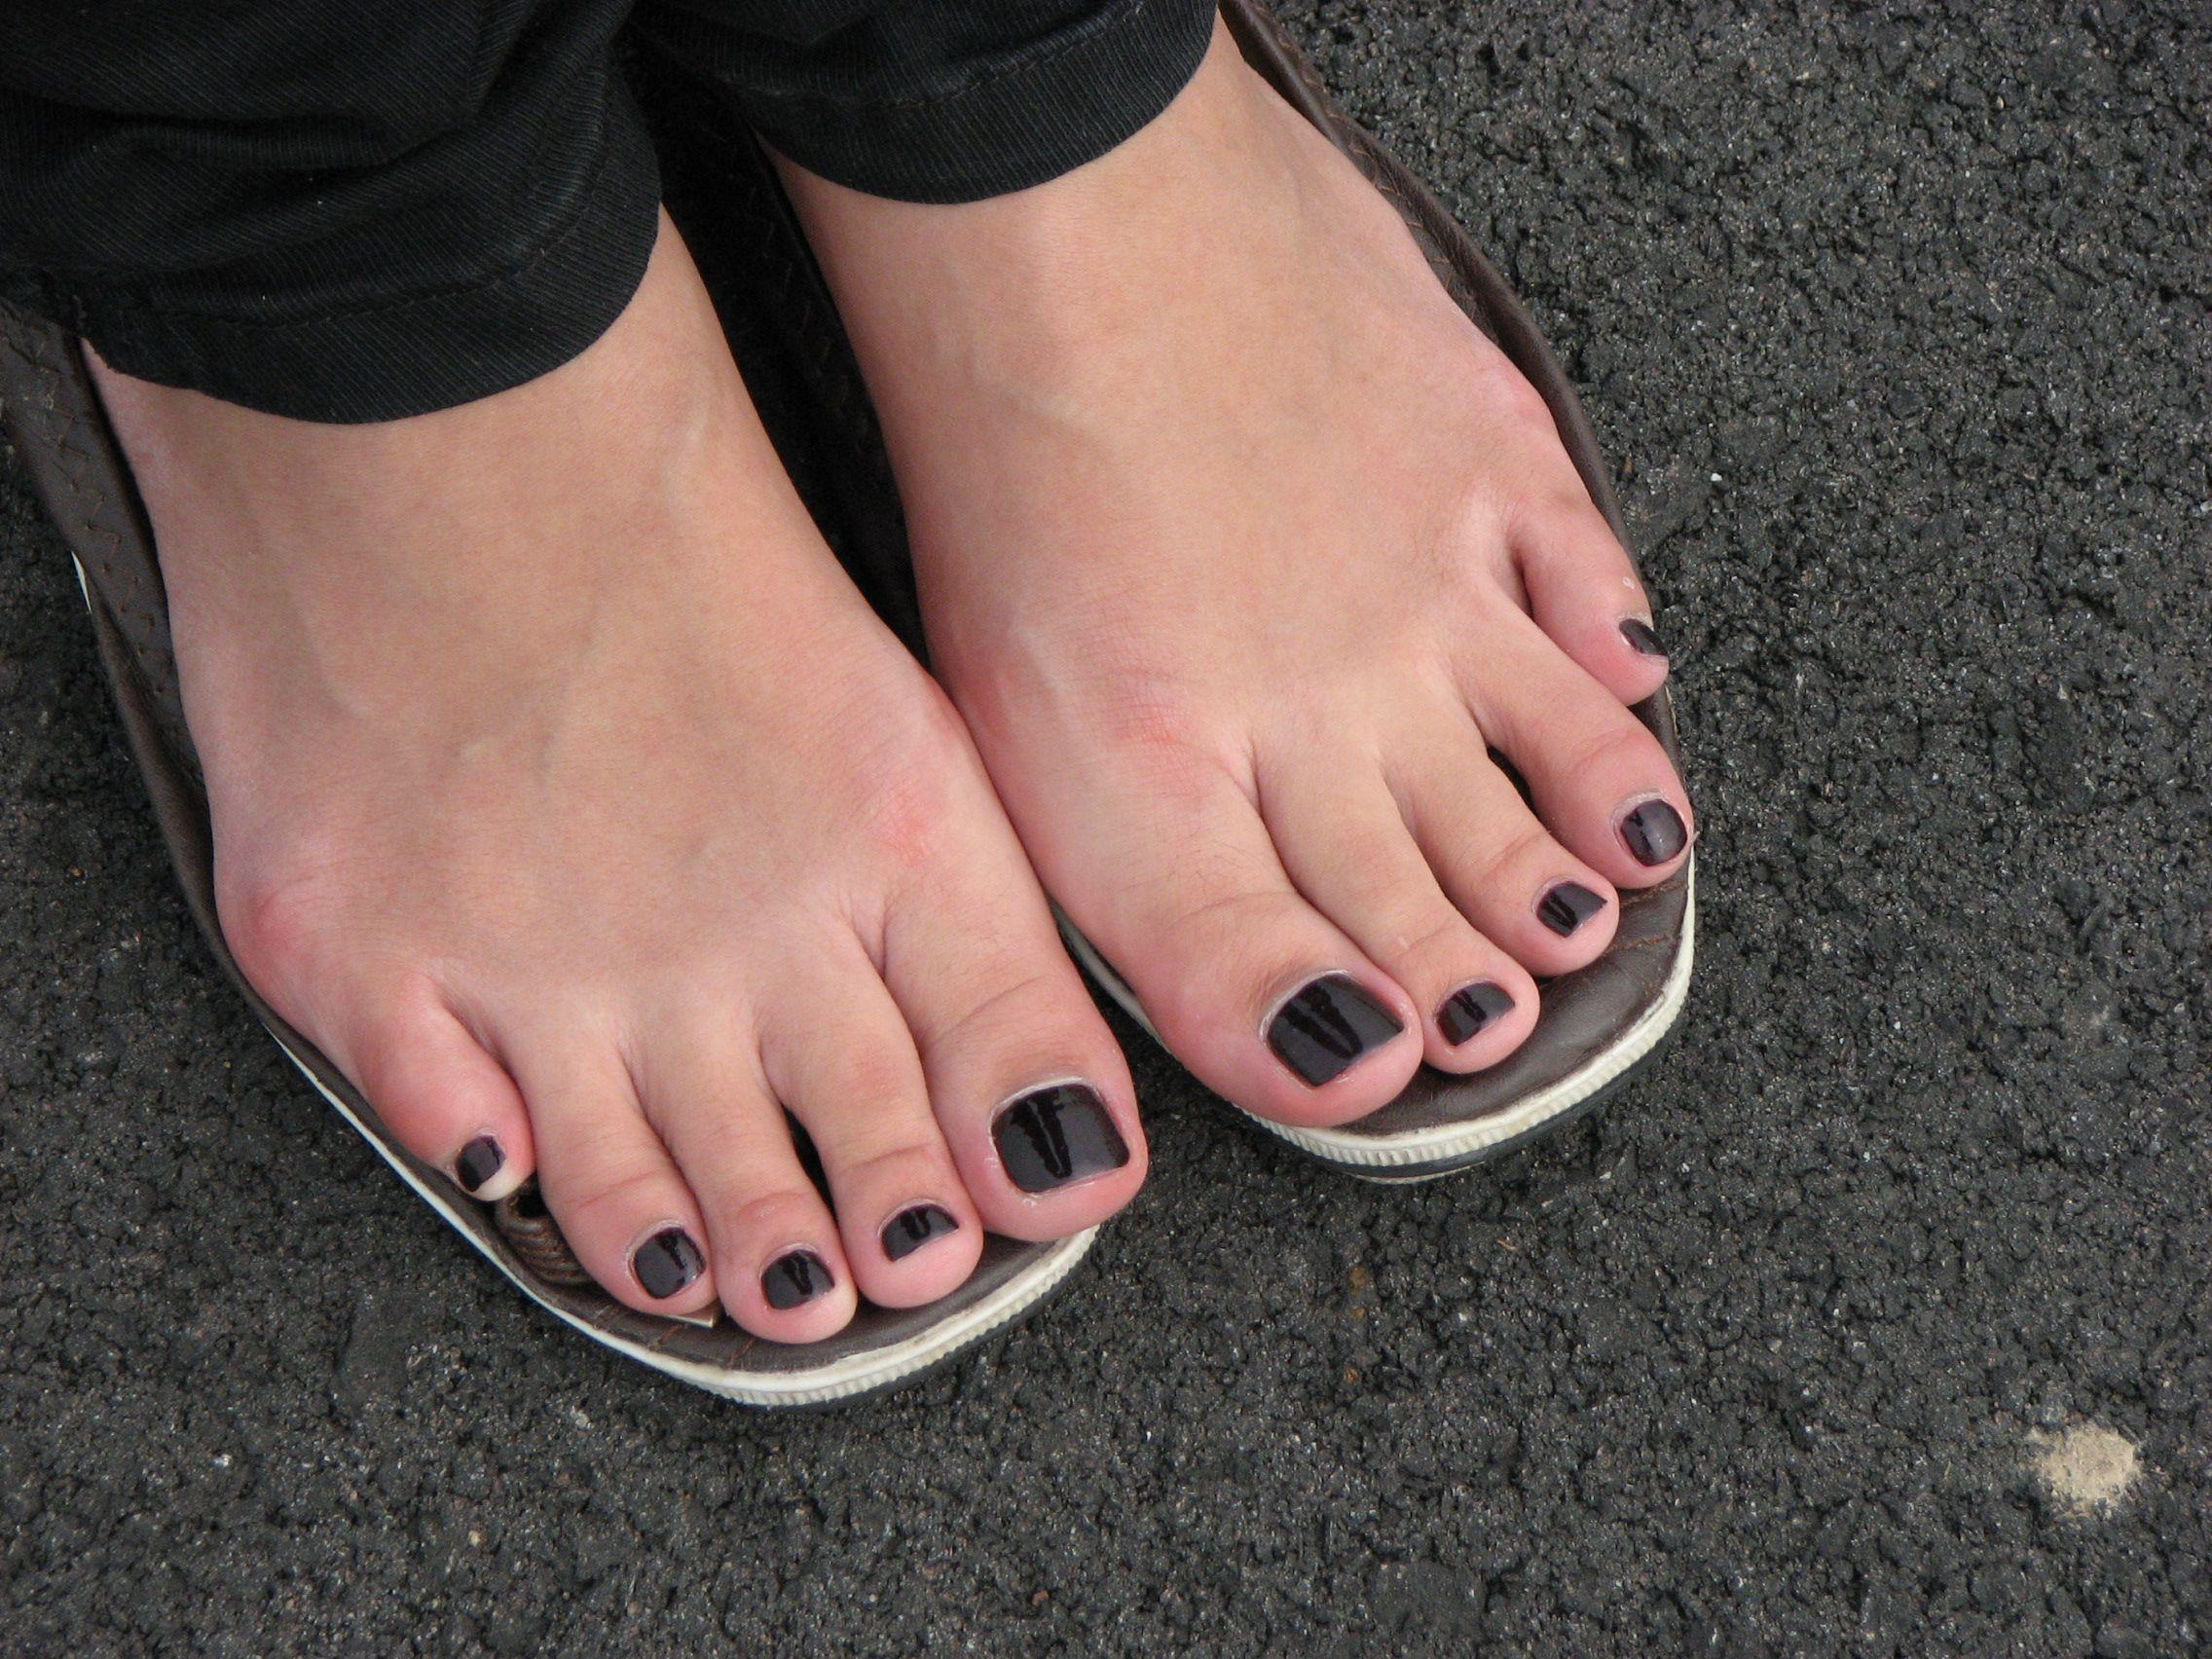 Black painted toenail fetish